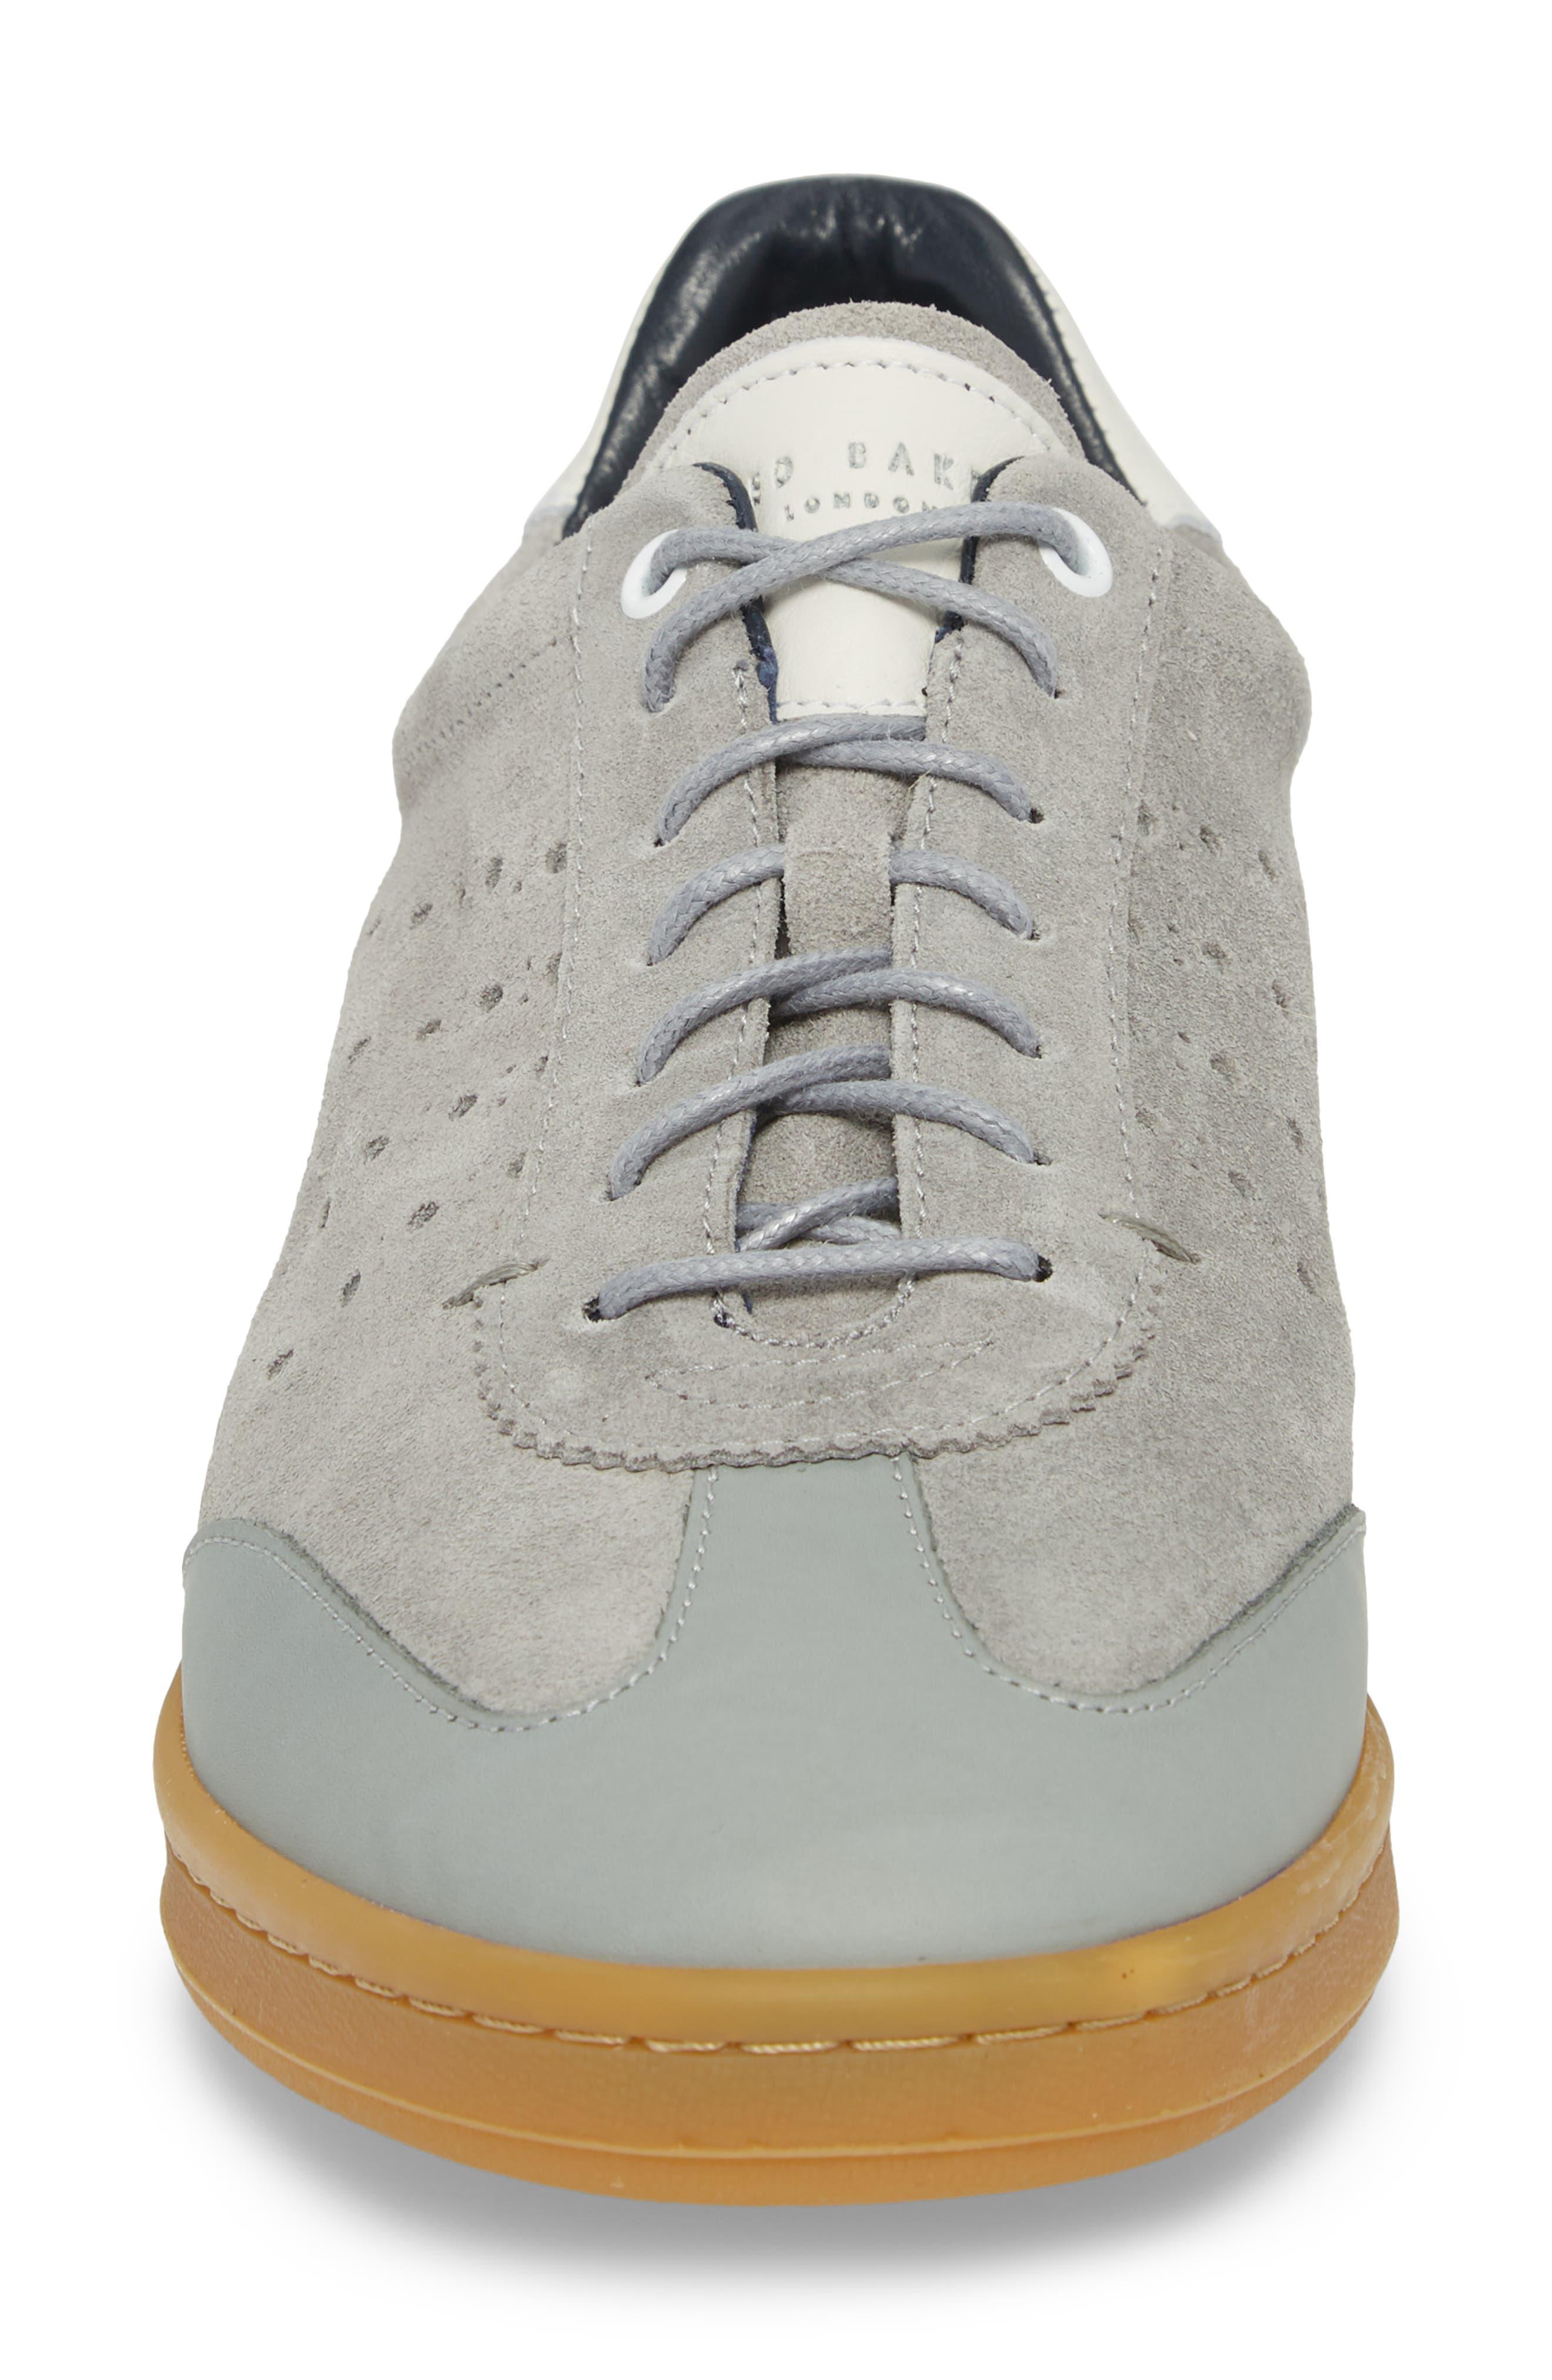 Orlees Low Top Sneaker,                             Alternate thumbnail 4, color,                             052